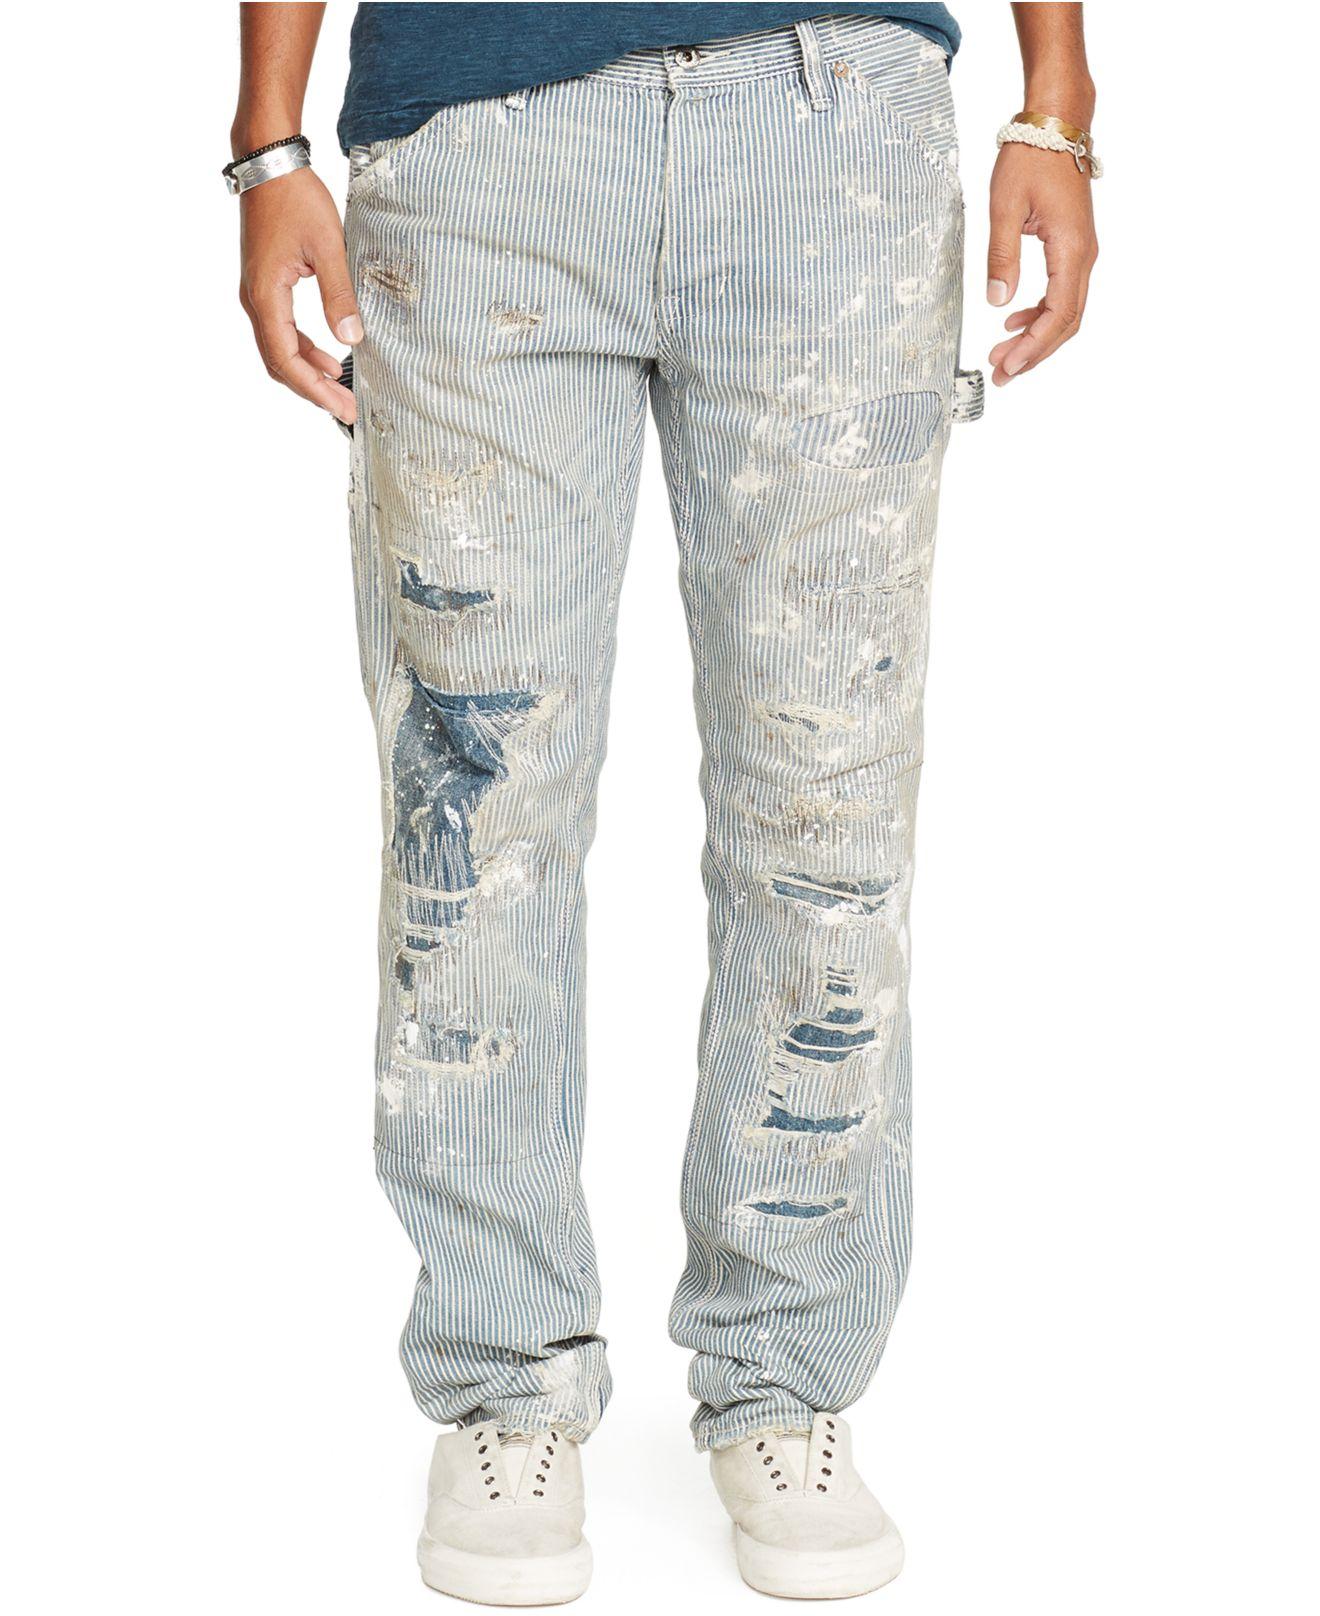 denim supply ralph lauren tapered straight fit abram jeans in blue for men lyst. Black Bedroom Furniture Sets. Home Design Ideas